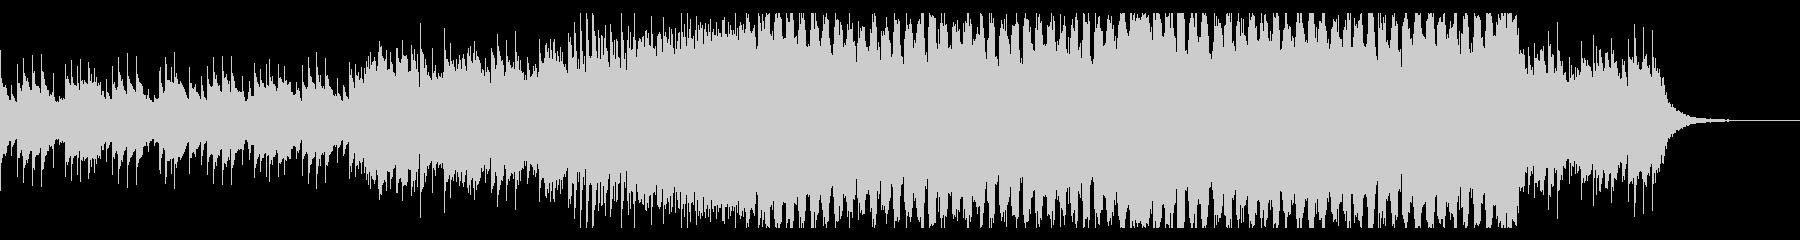 【CM・企業VP】EDMアンセム風の未再生の波形